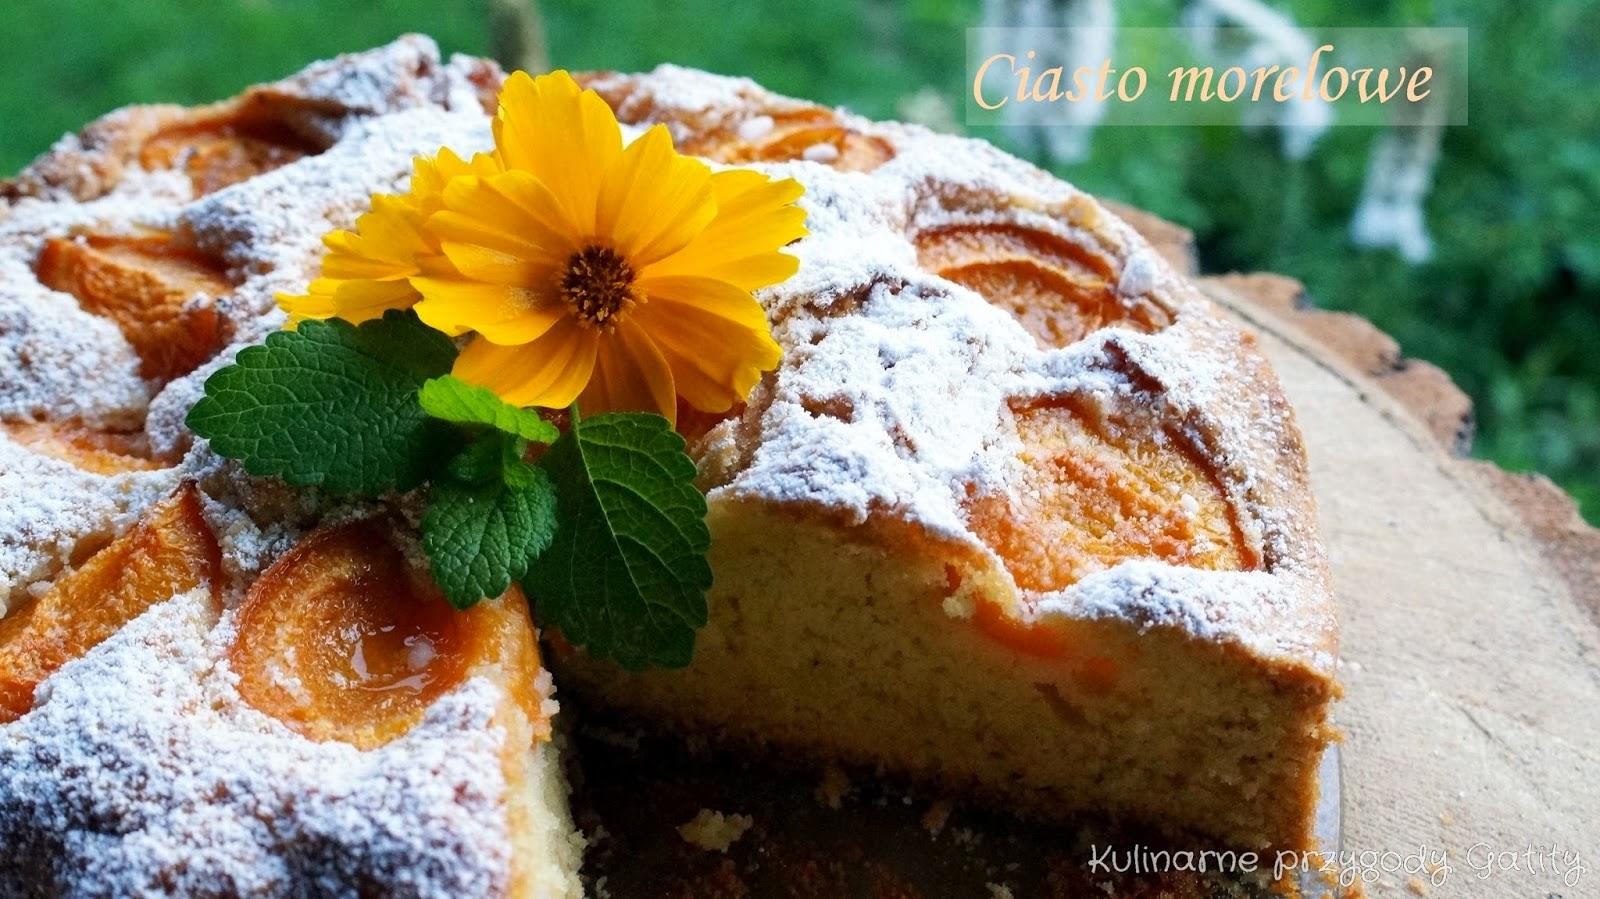 ciasto-z-kawalkami-owocow